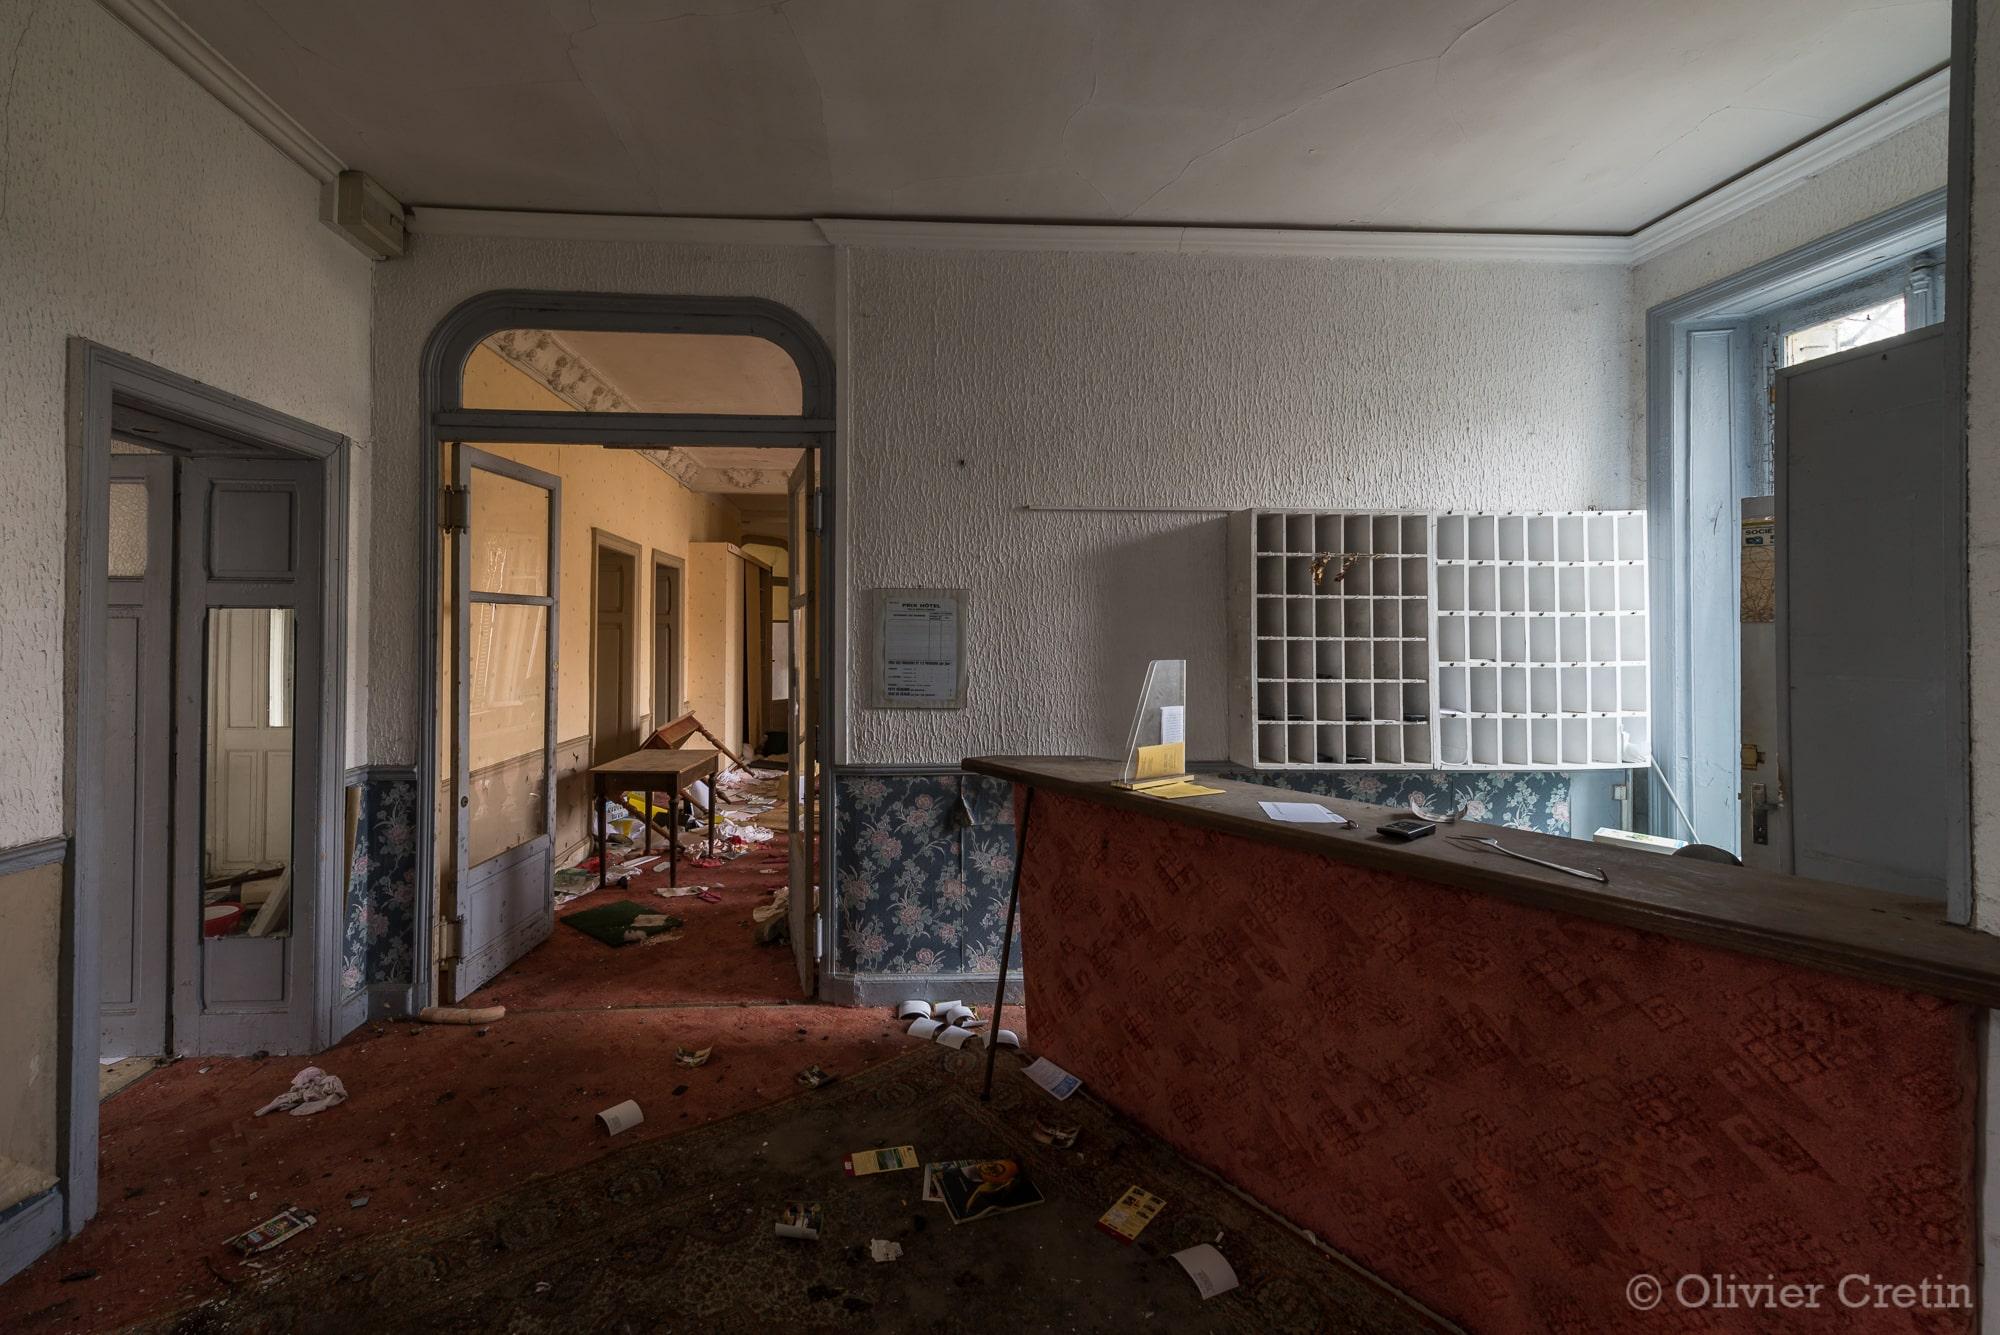 L'Hôtel Brice – La trilogie thermale I